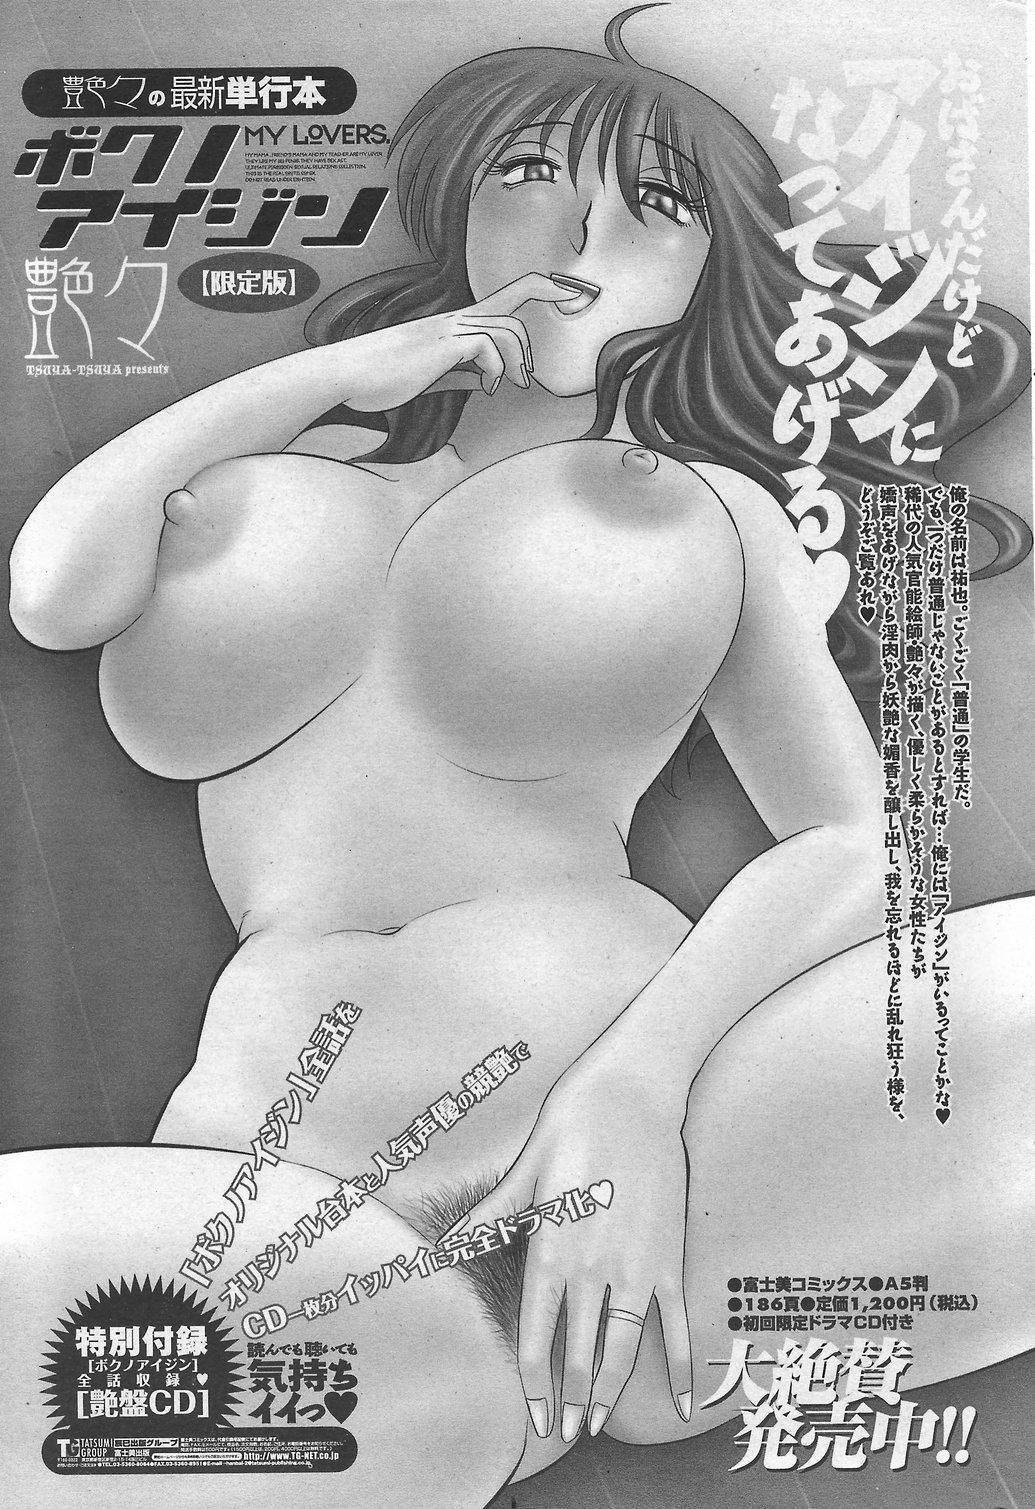 COMIC Penguin Club Sanzokuban 2007-10 Vol. 225 36